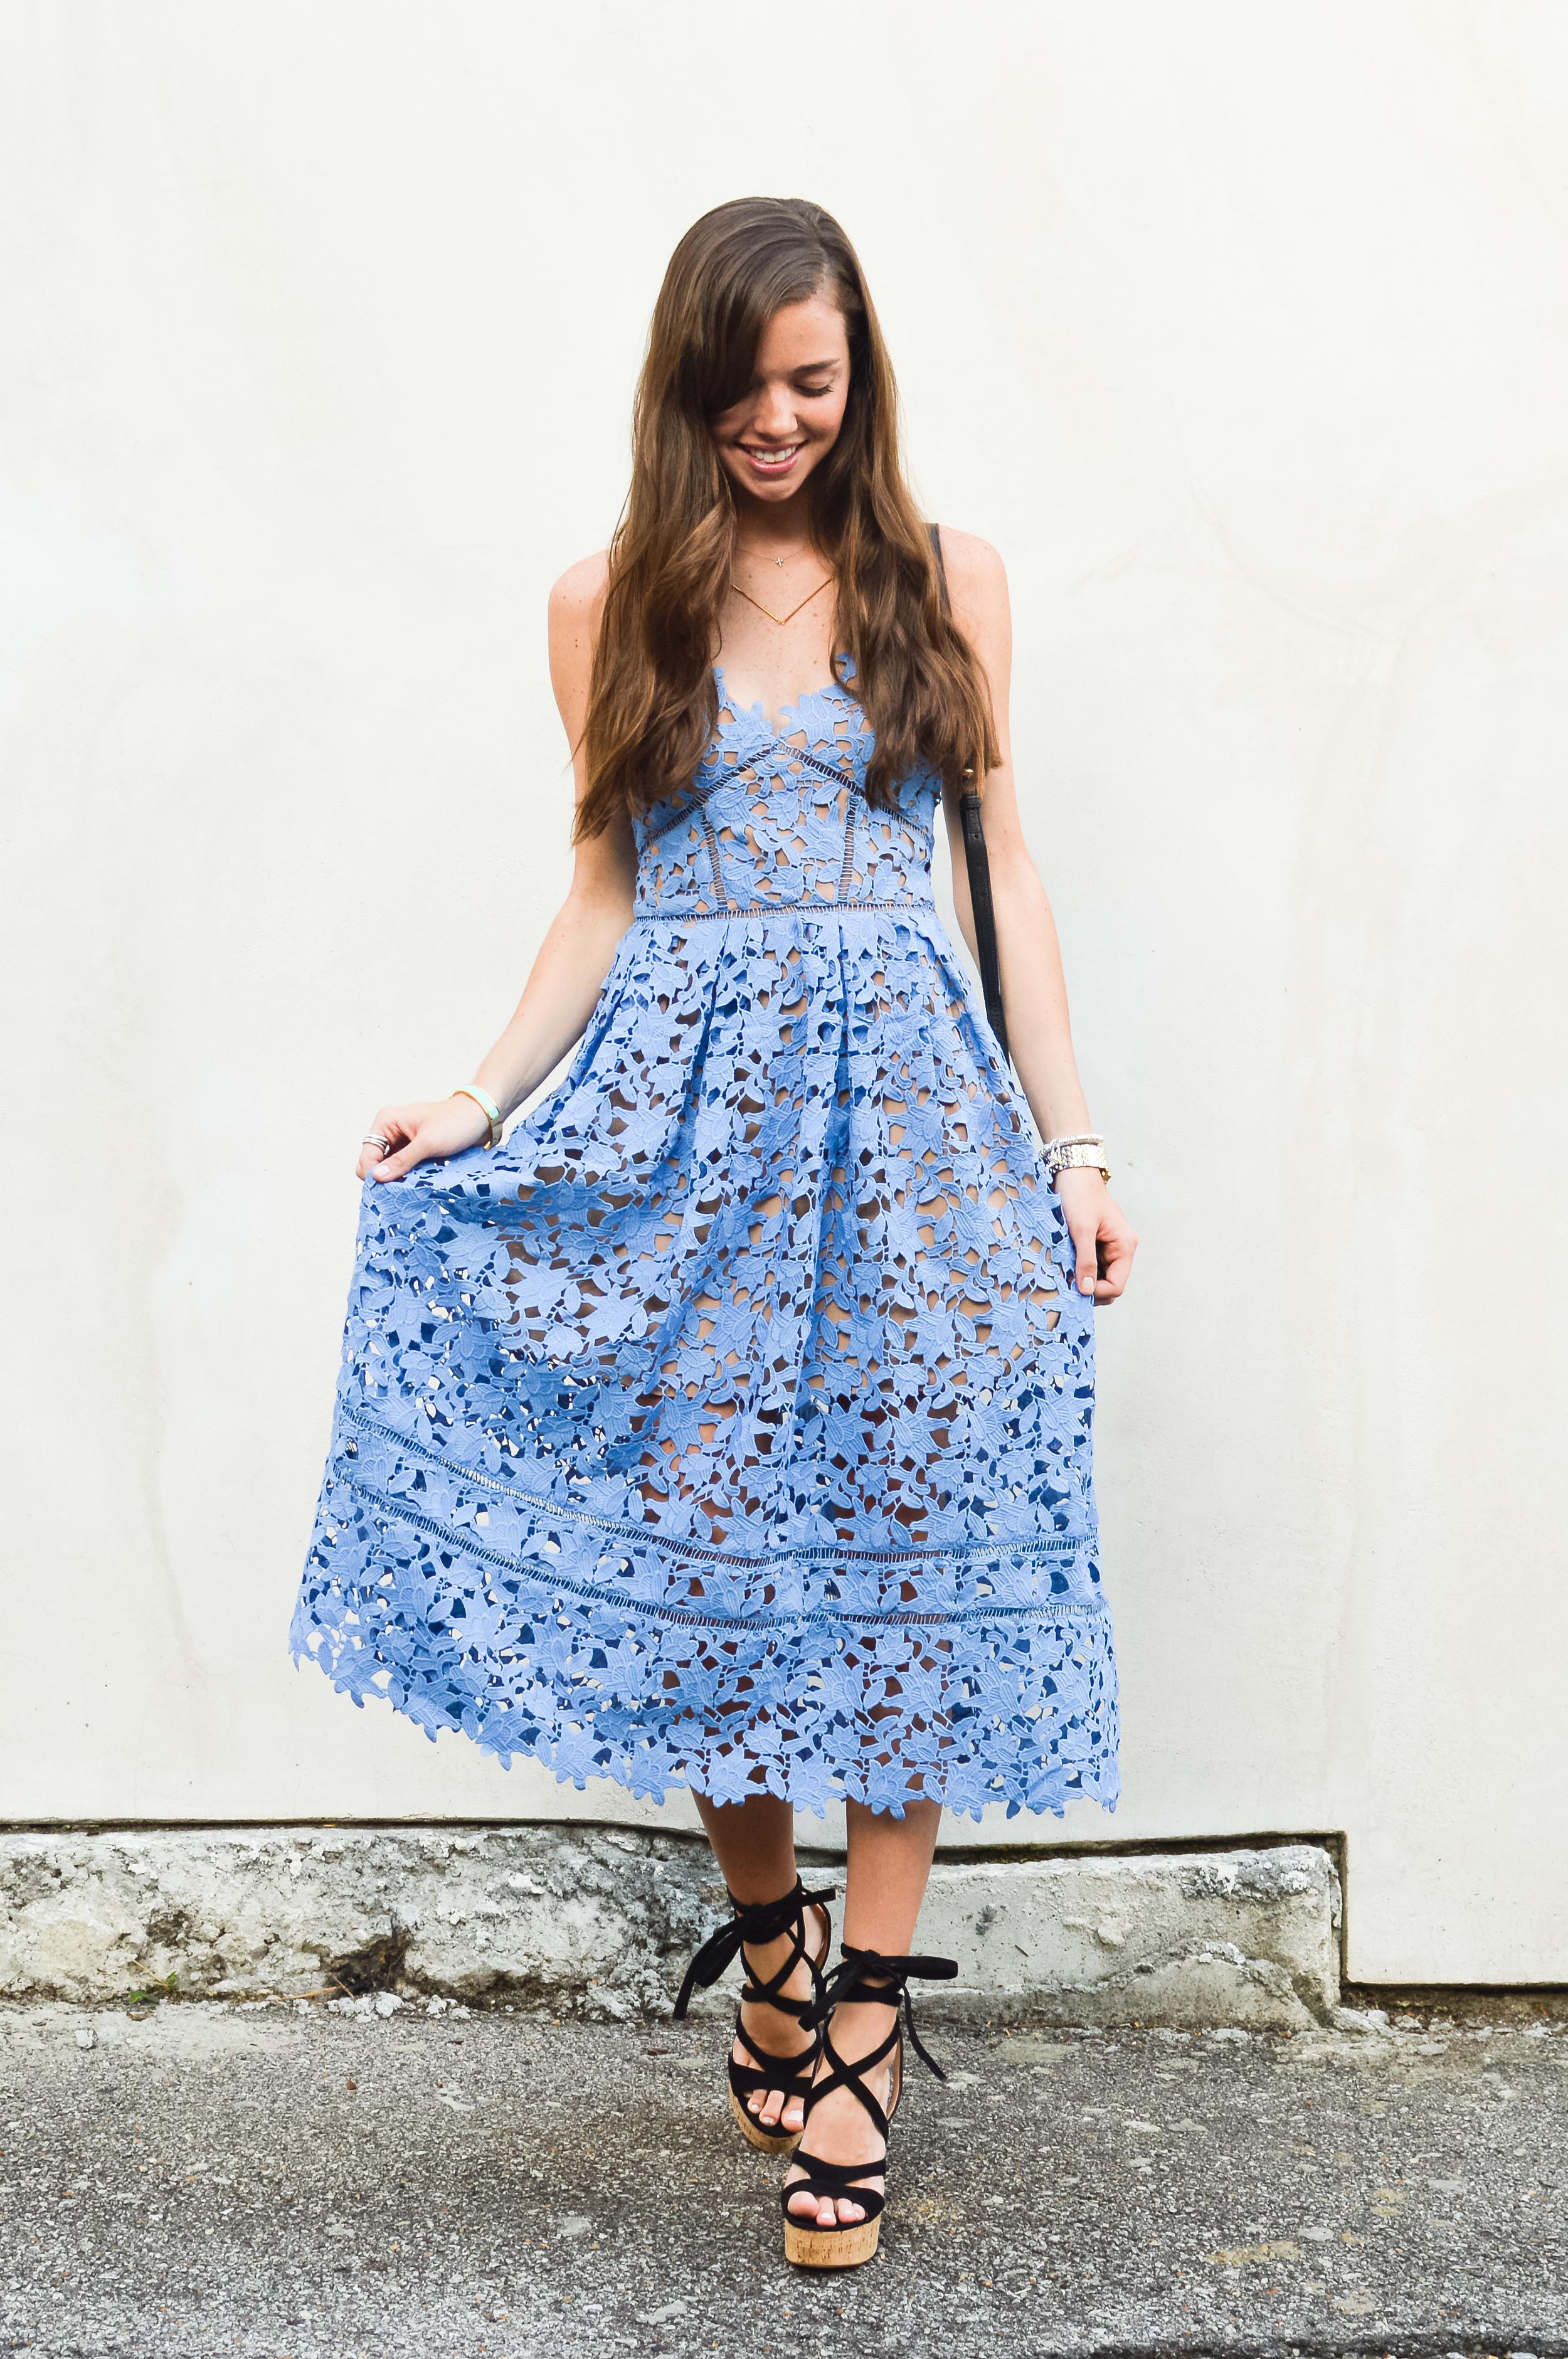 lcb_style_fashion_blogger_selfportrait_dress (25 of 48).jpg